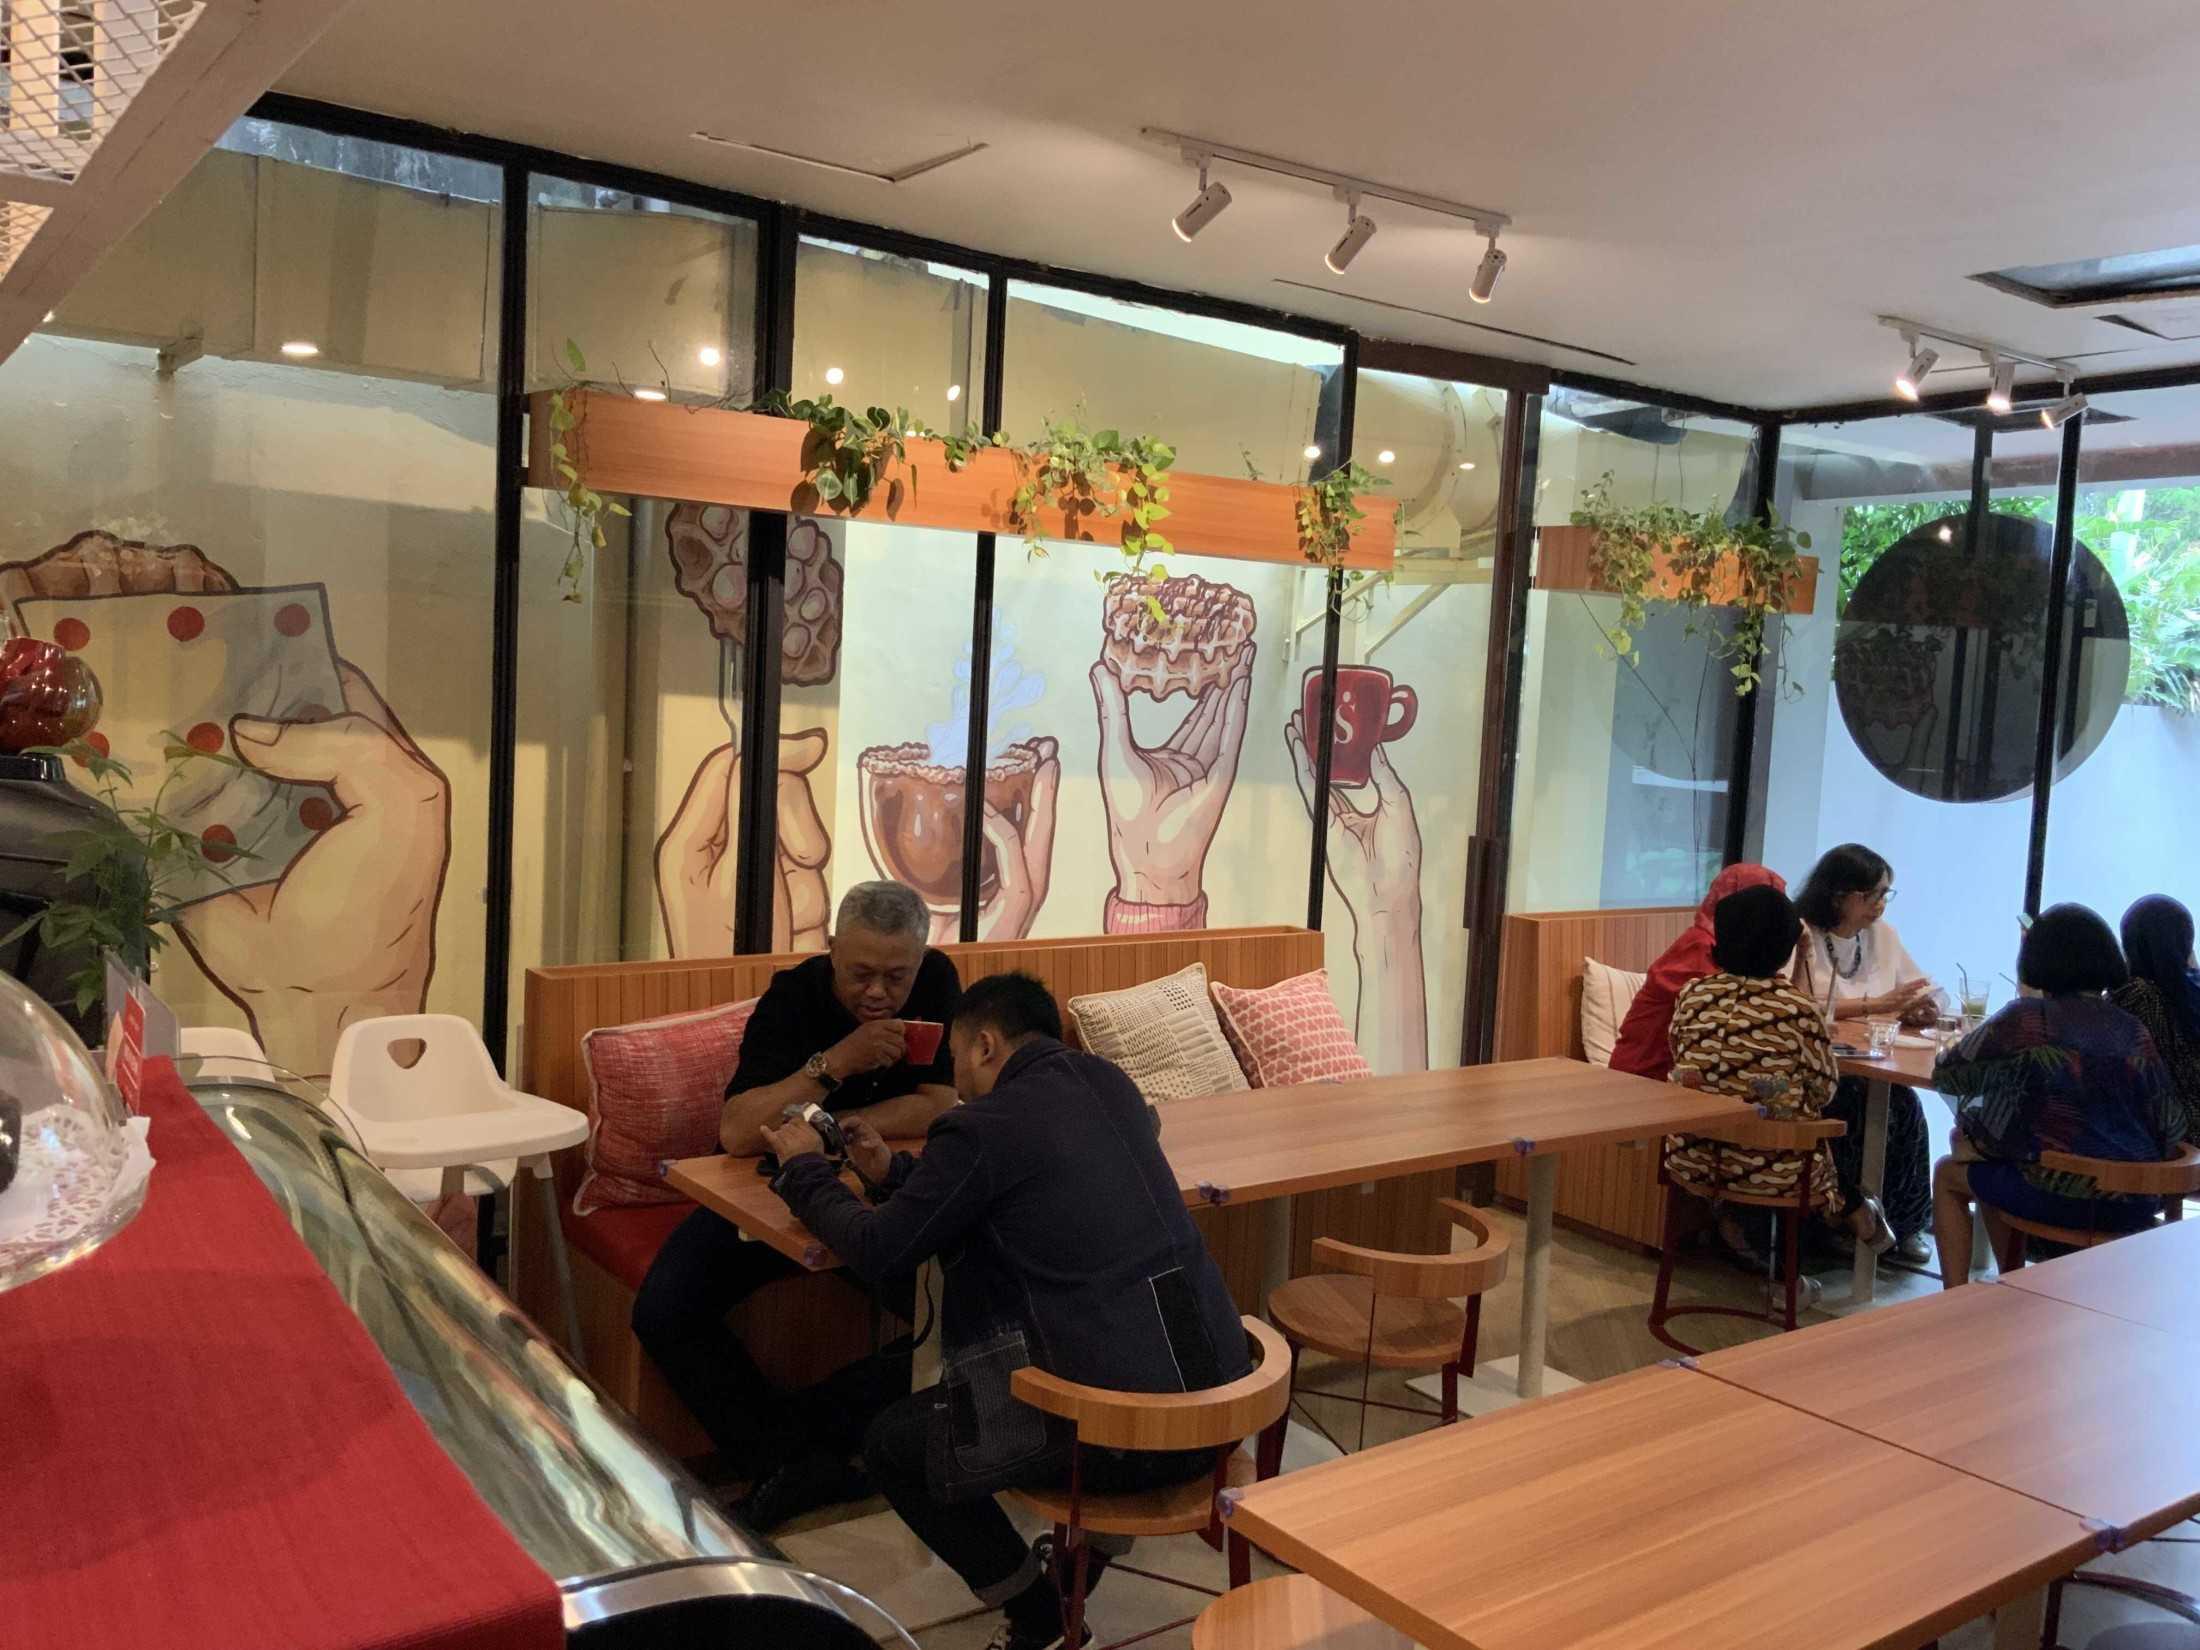 Bito Interior Design N Build Singgah Kitchen & Coffee Jl. Pakubuwono Vi No.2, Rt.1/rw.4, Gunung, Kec. Kby. Baru, Kota Jakarta Selatan, Daerah Khusus Ibukota Jakarta 12120, Indonesia Jl. Pakubuwono Vi No.2, Rt.1/rw.4, Gunung, Kec. Kby. Baru, Kota Jakarta Selatan, Daerah Khusus Ibukota Jakarta 12120, Indonesia Bito-Interior-Design-N-Build-Singgah-Kitchen-Coffee  90040